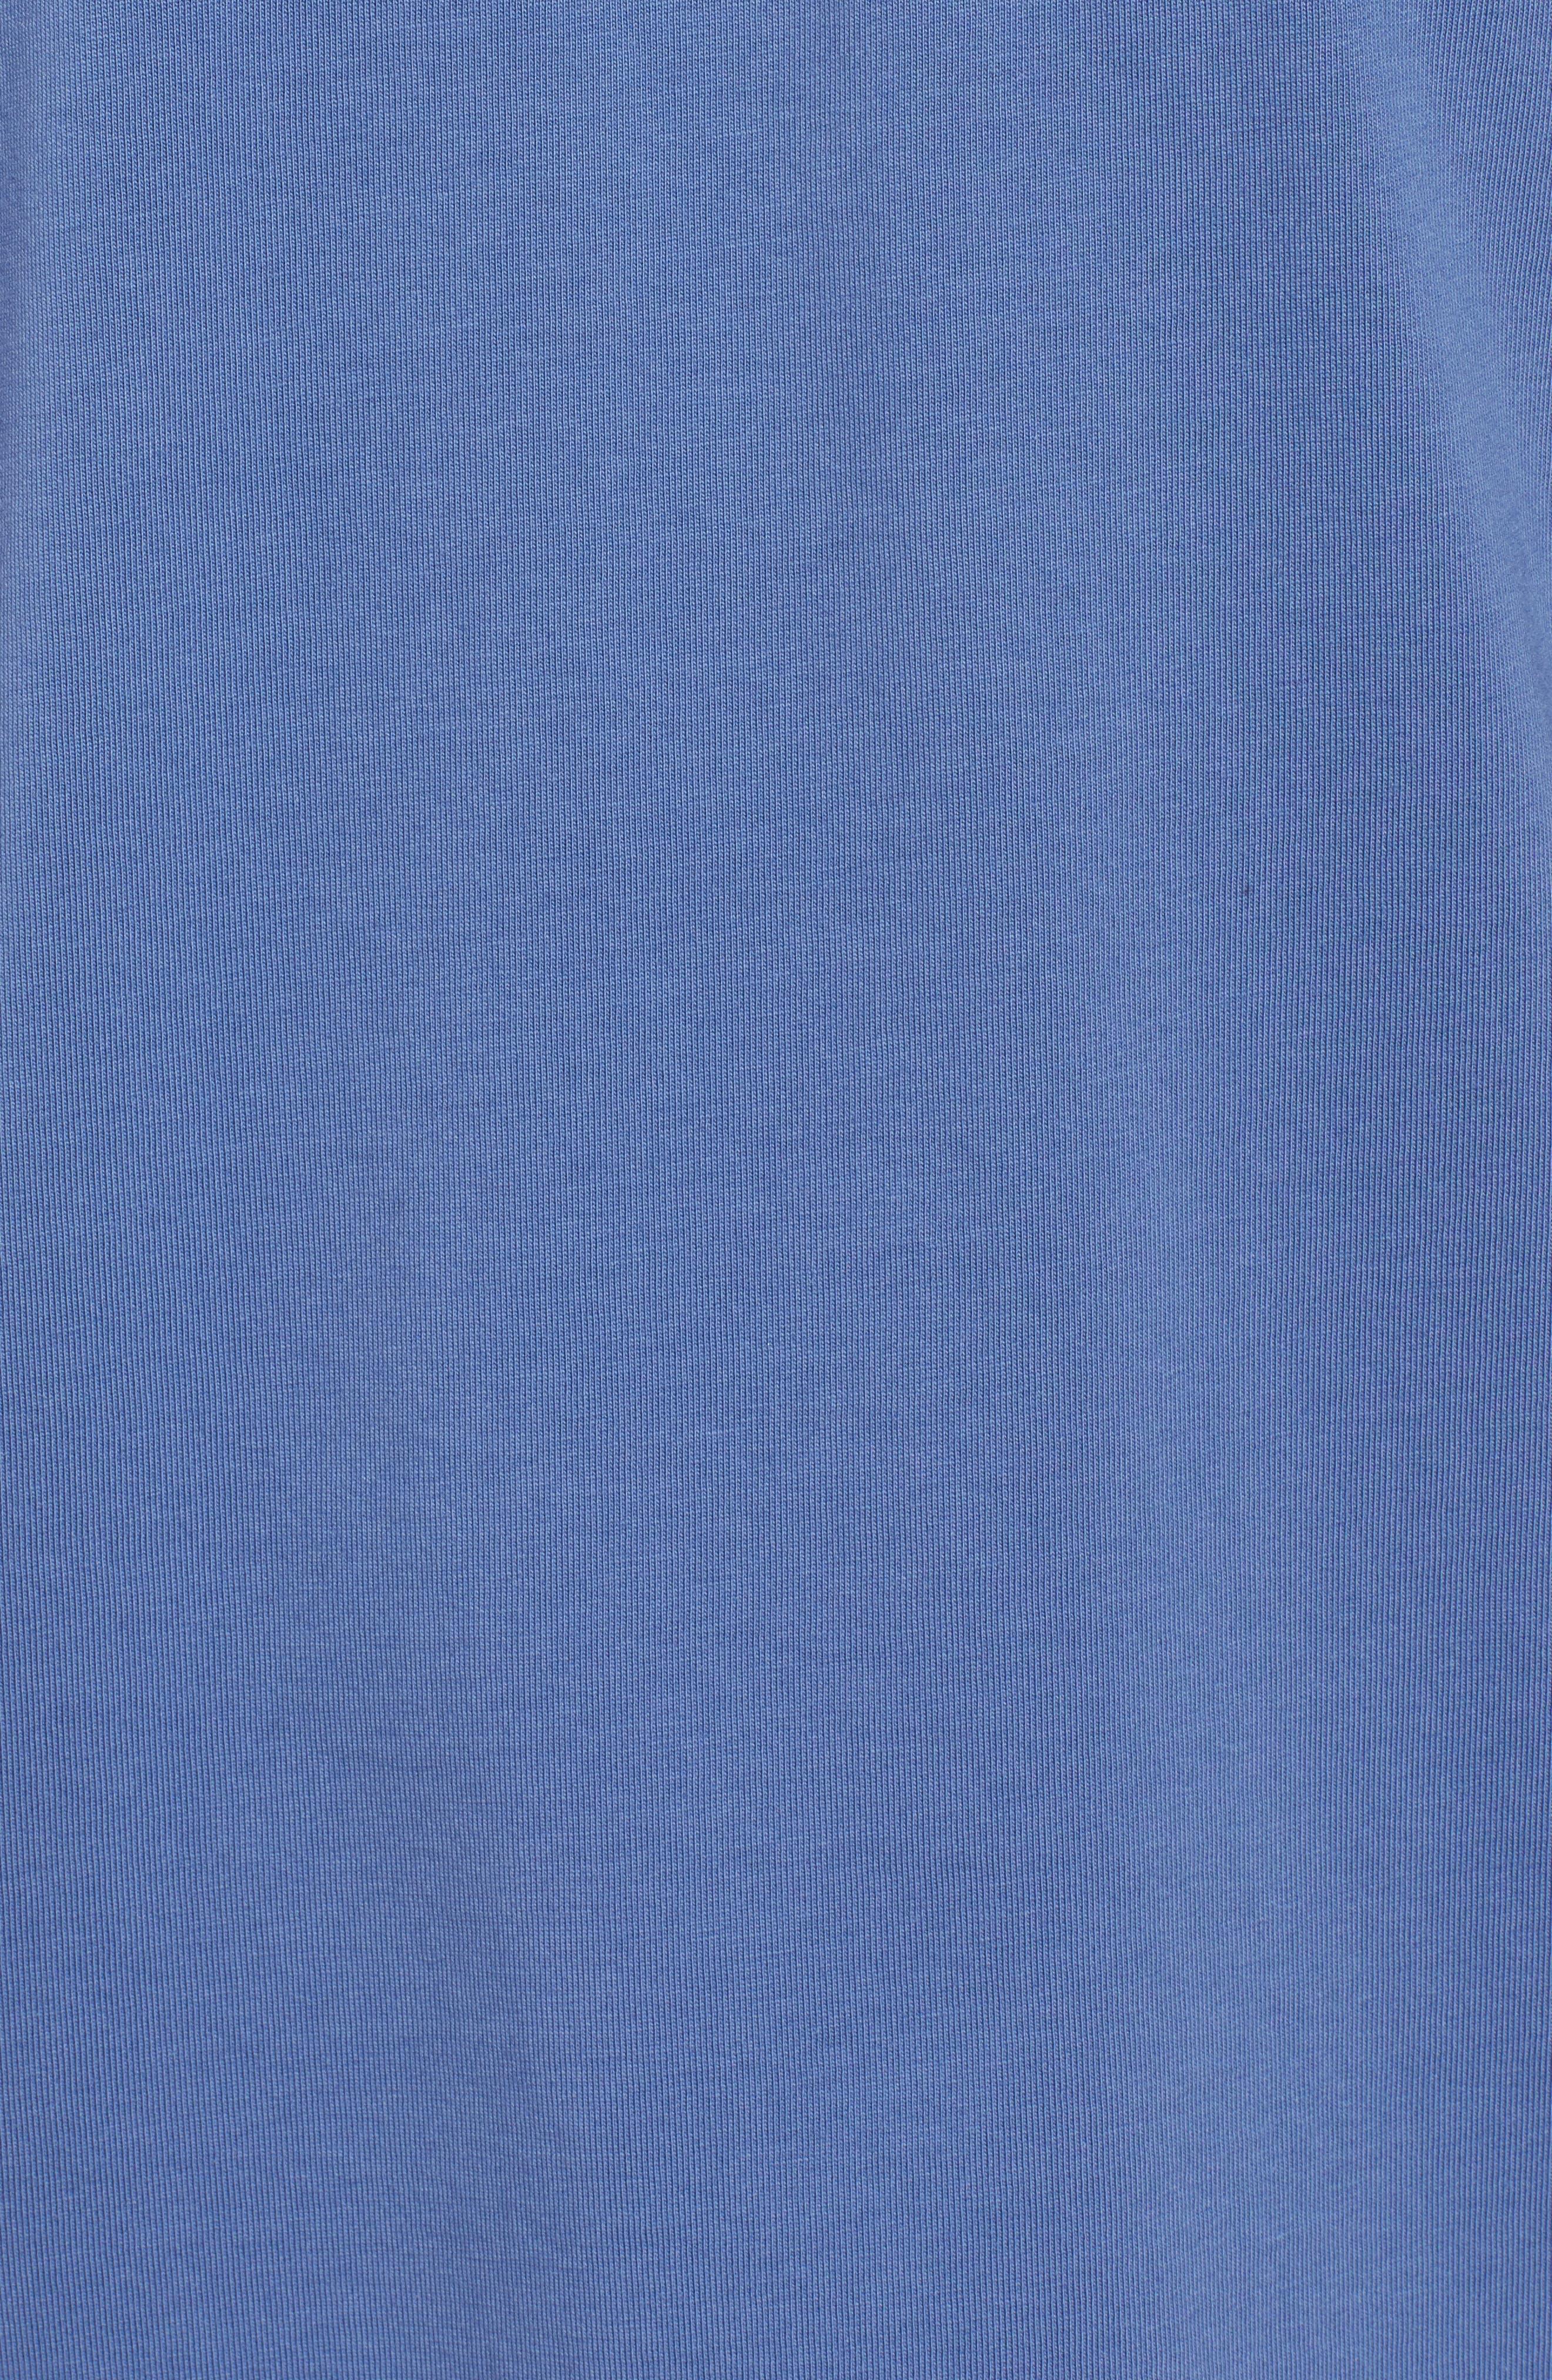 American Sportfisher T-Shirt,                             Alternate thumbnail 5, color,                             Moonshine